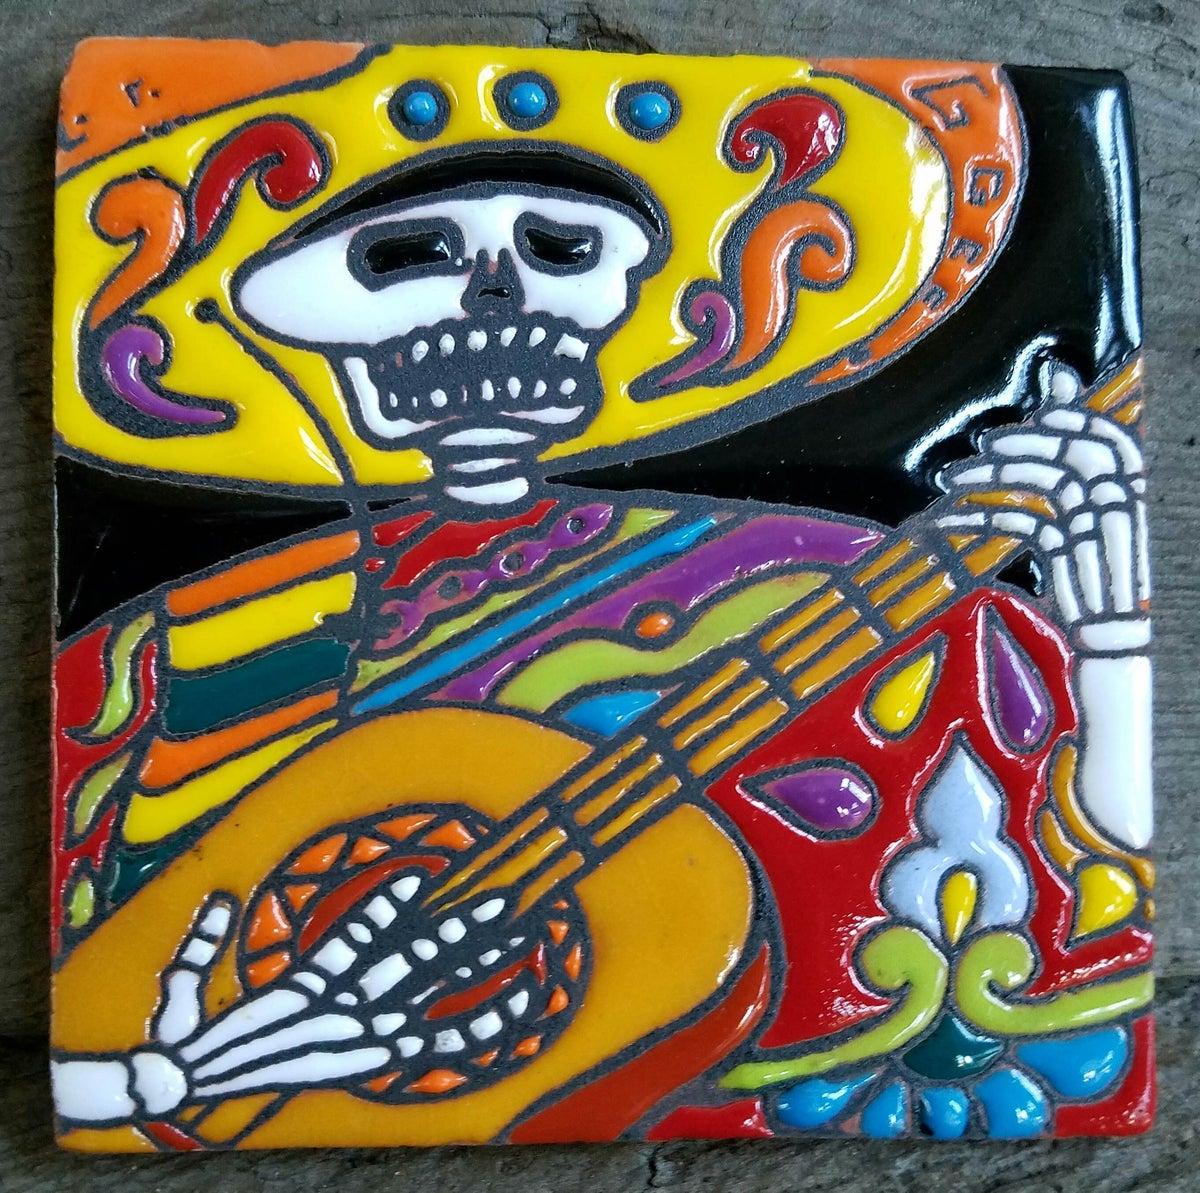 Image of Skull Guitar Coaster Tile